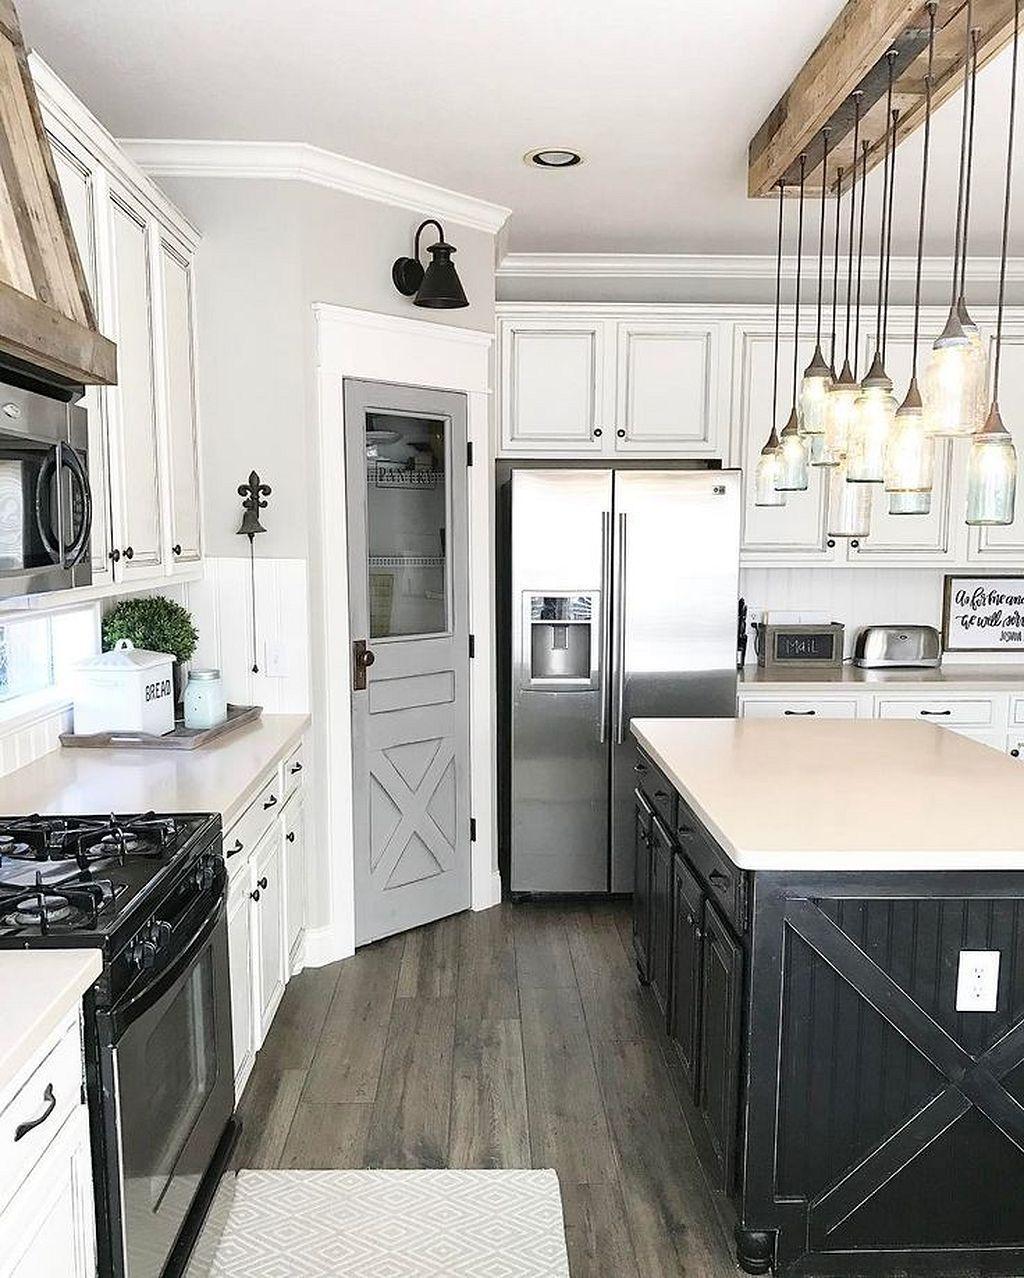 Farmhouse Kitchen Ideas On A Budget 2018 33 Rustic Farmhouse Kitchen Modern Farmhouse Kitchens Farmhouse Kitchen Decor